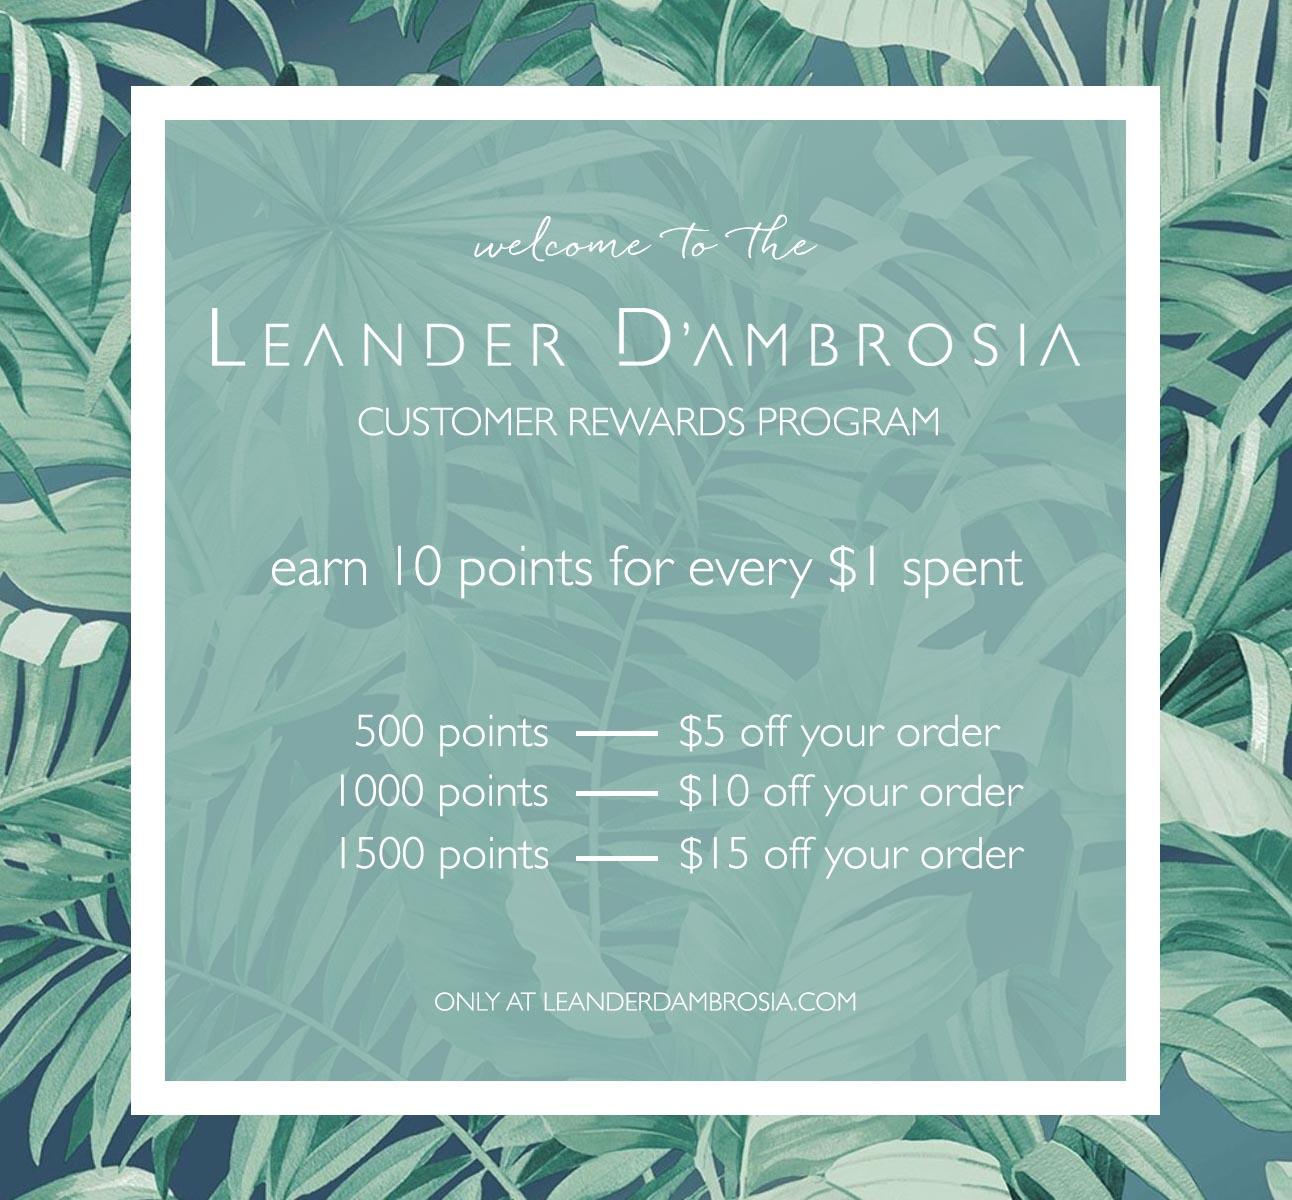 rewards-program-promo-small2.jpg